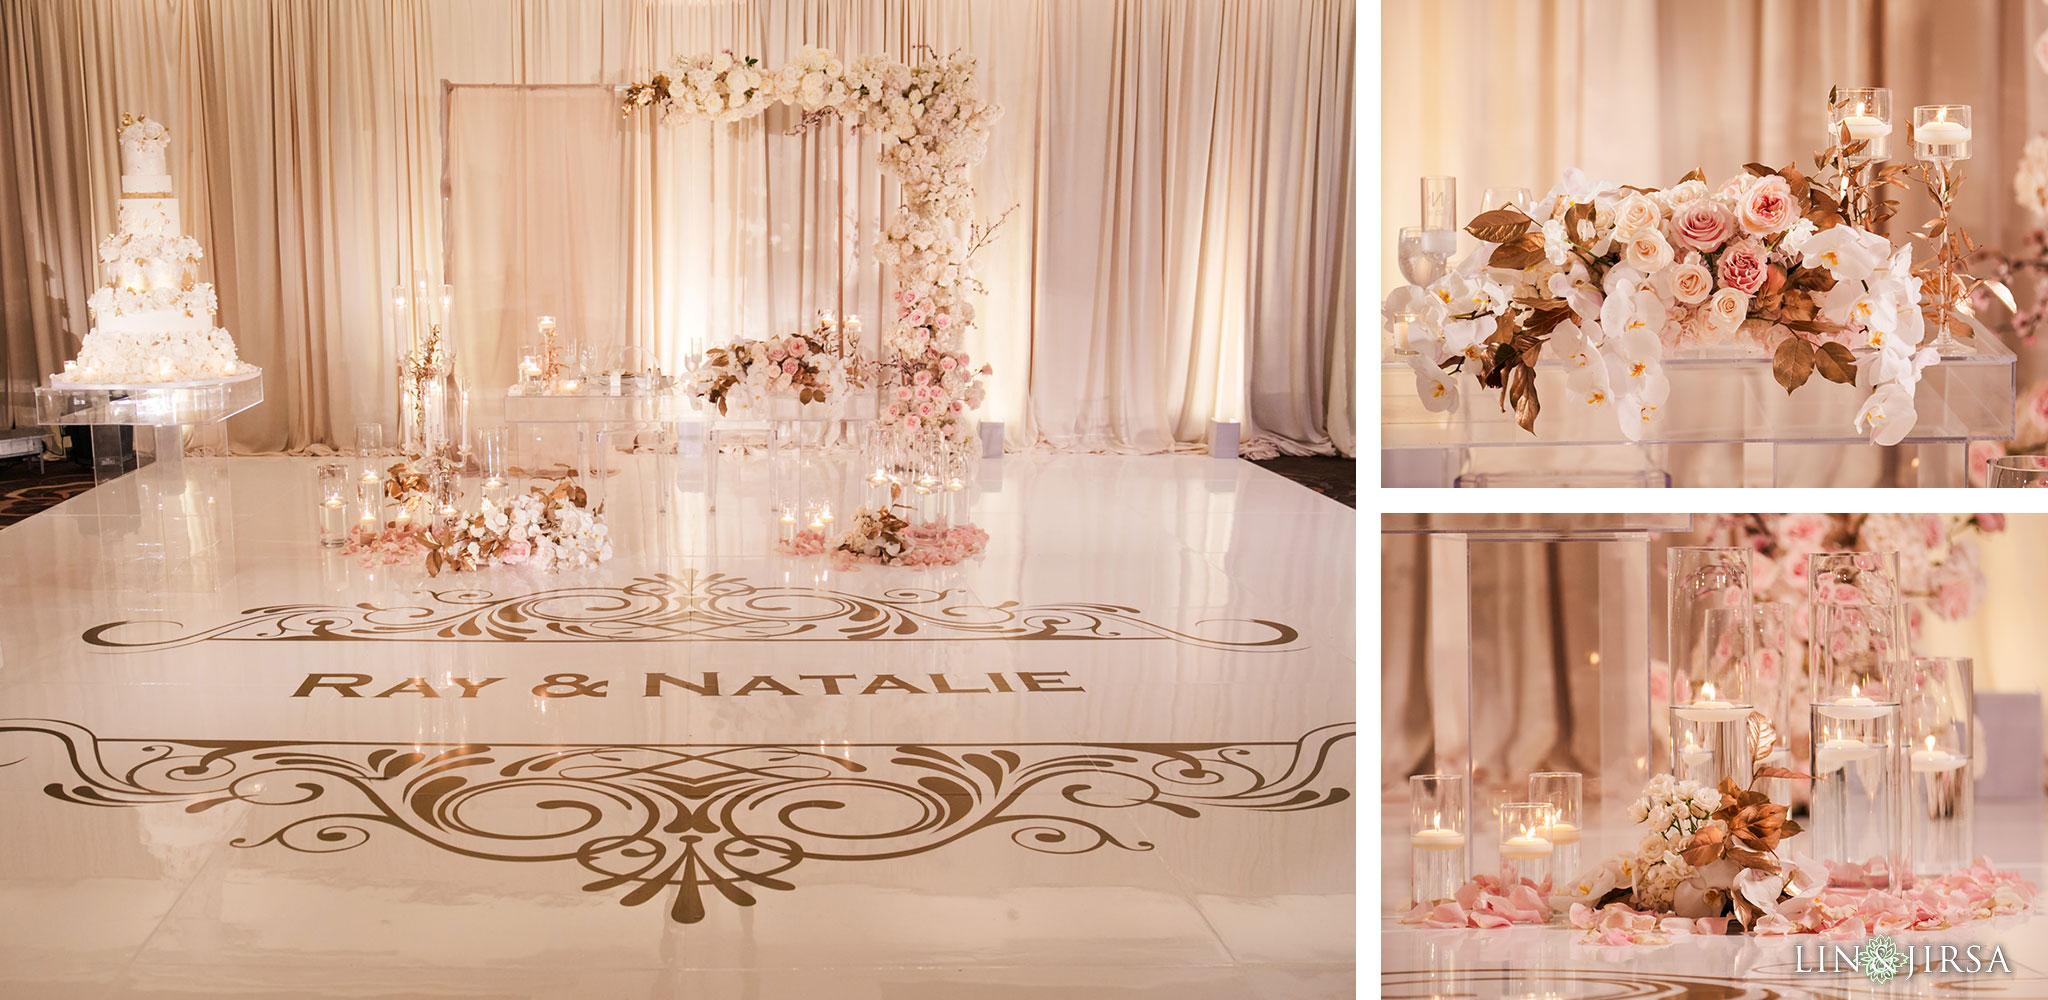 028 hilton costa mesa orange county vietnamese wedding photography